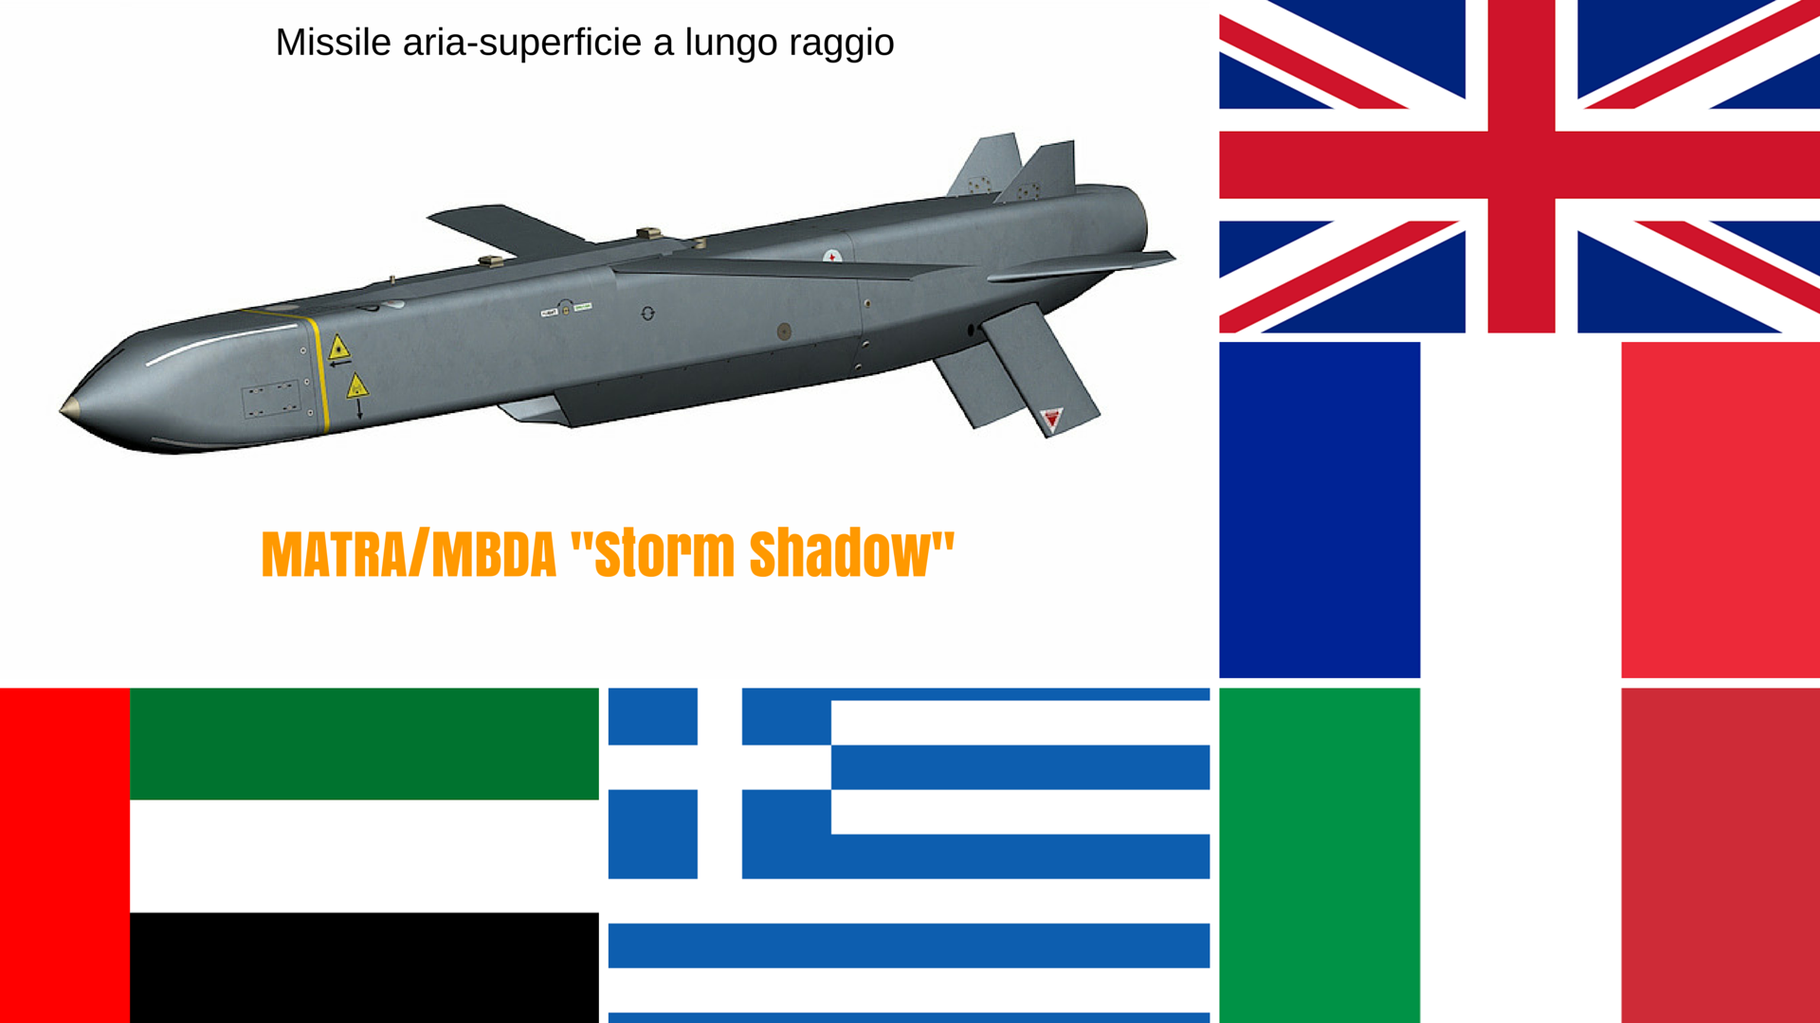 I principali utilizzatori dello Storm Shadow sono Inghilterra (Tornado Gr4/Typhoon), Francia (Rafale/Mirage 2000), Italia (Tornado IDS/Typhoon) Grecia (Mirage 2000), Emirati Arabi (Mirage 2000).